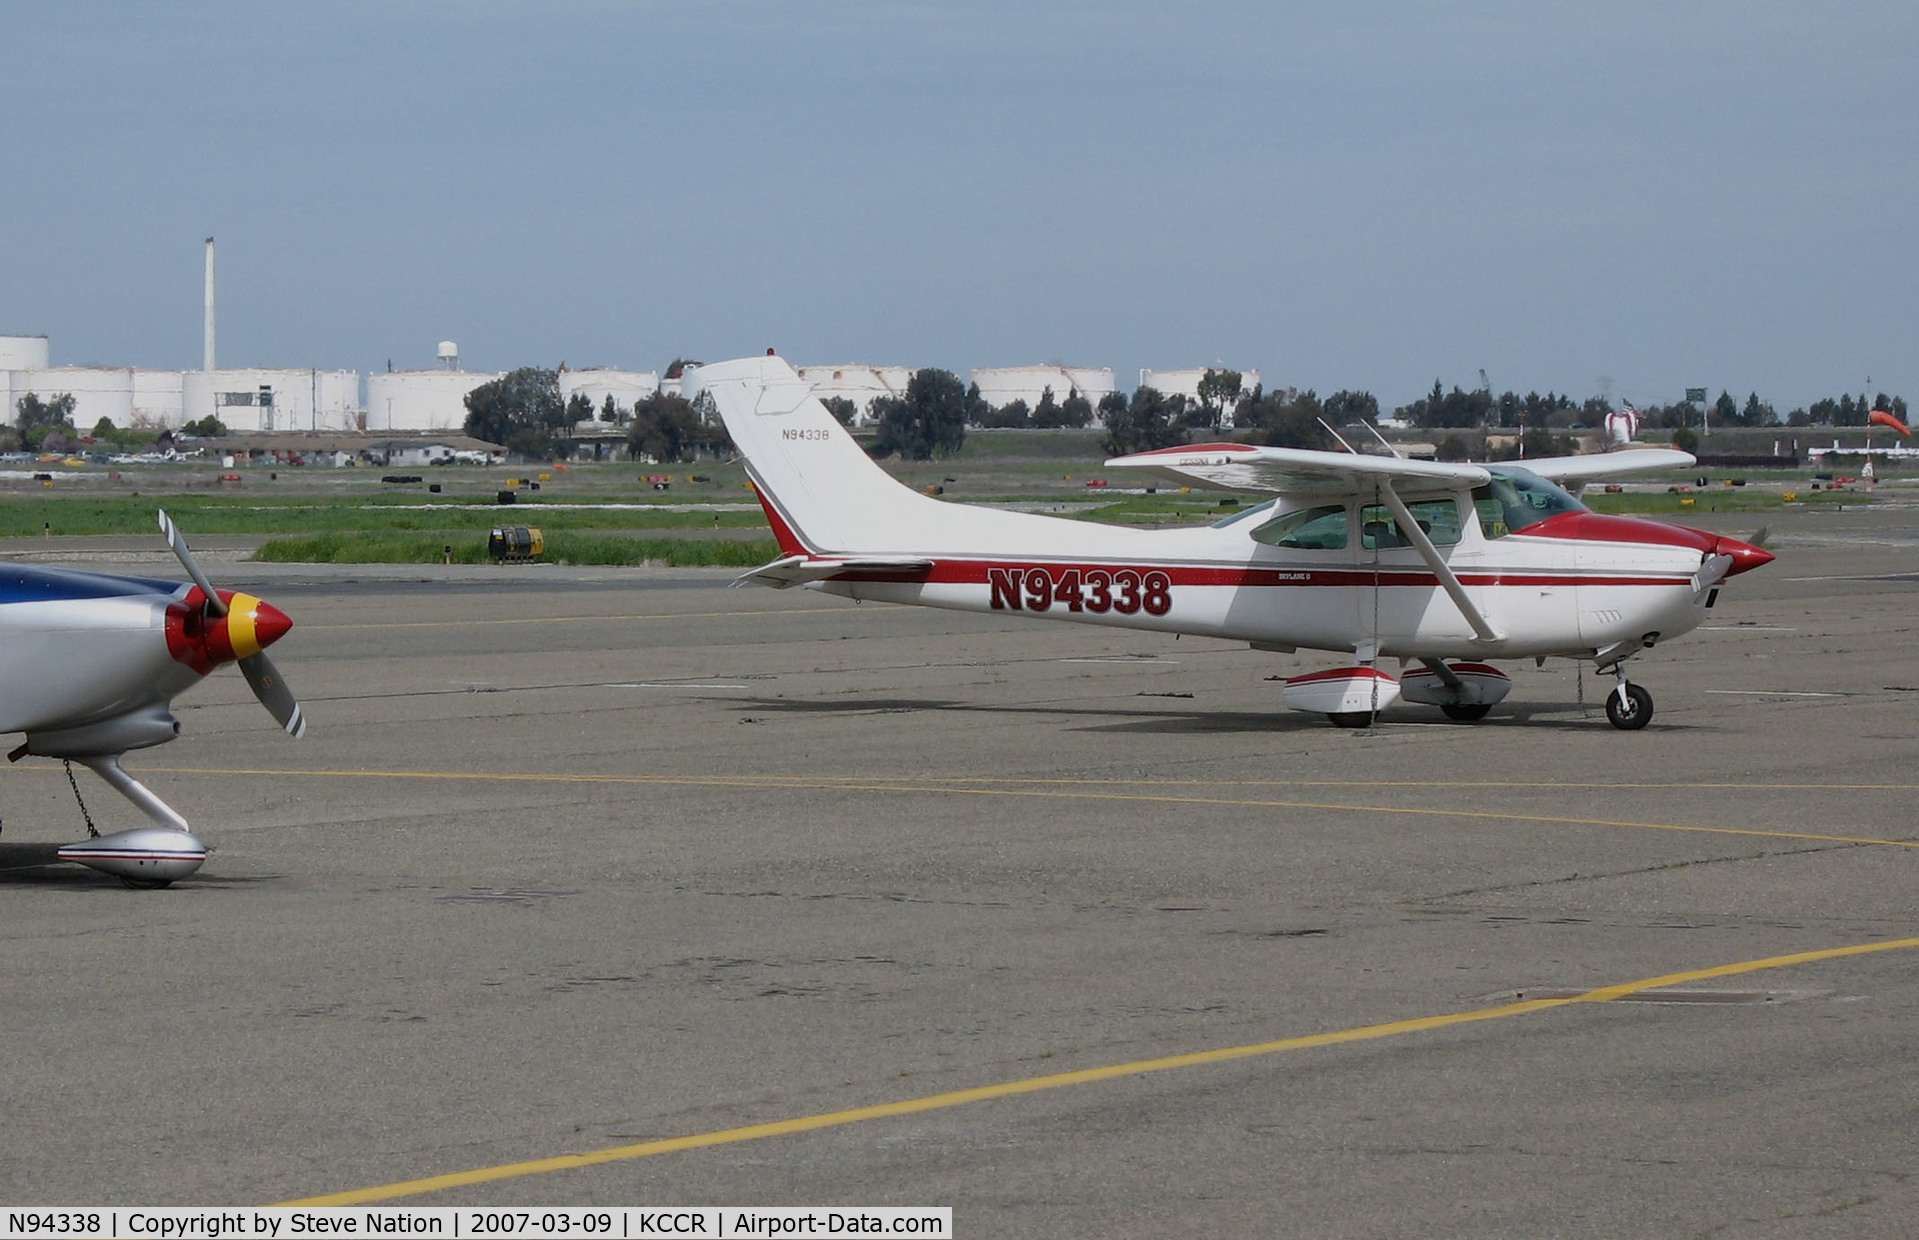 N94338, 1978 Cessna 182Q Skylane C/N 18266415, Napa County Airport, CA-based 1978 Cessna 182Q on Buchanan Field (Concord, CA) transient ramp